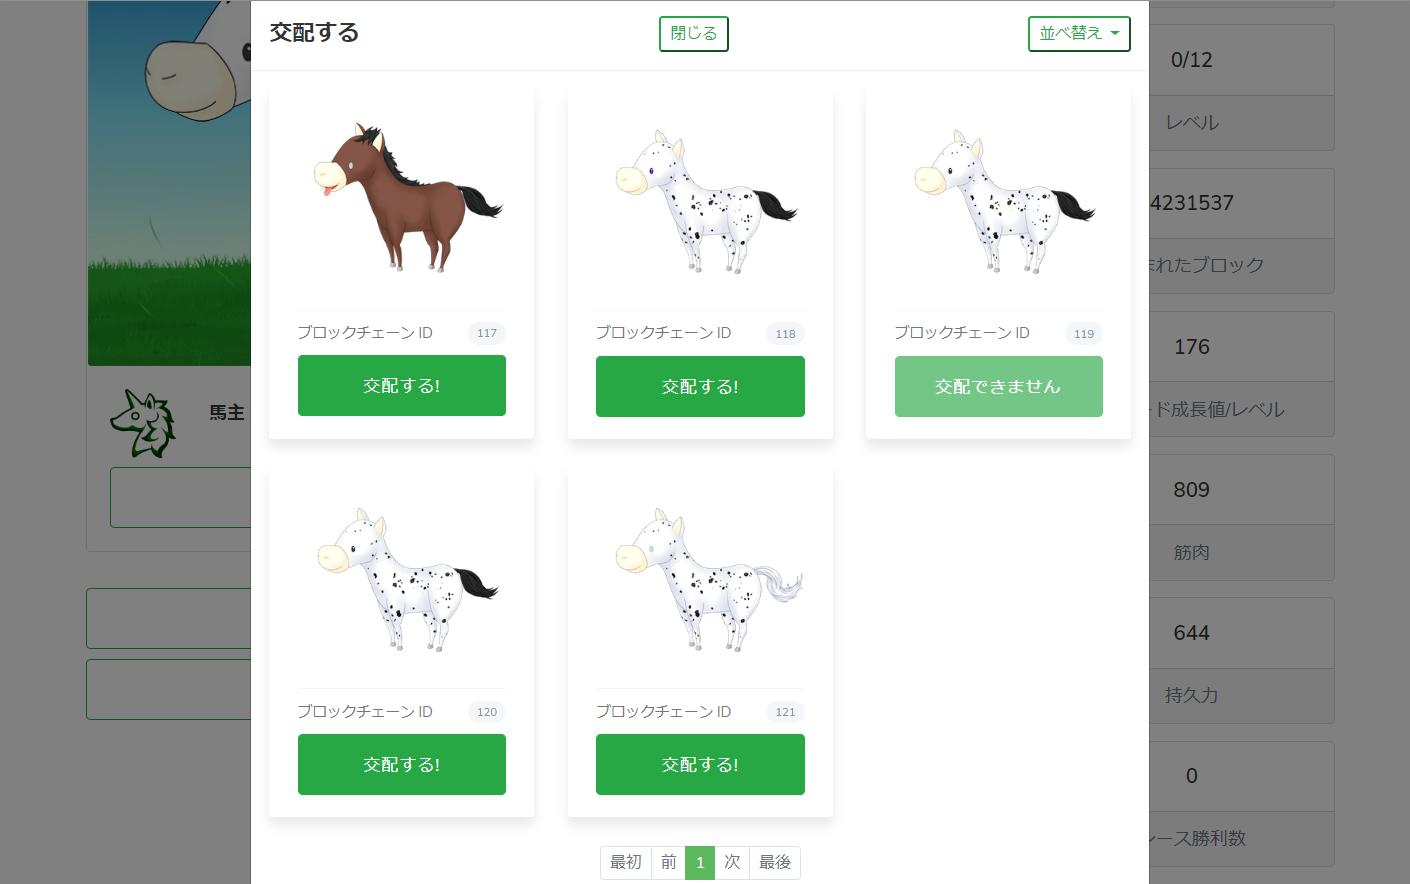 EtherDerbies イーサダービー 競馬 ブロックチェーン 仮想通貨 Dapps 始め方 遊び方